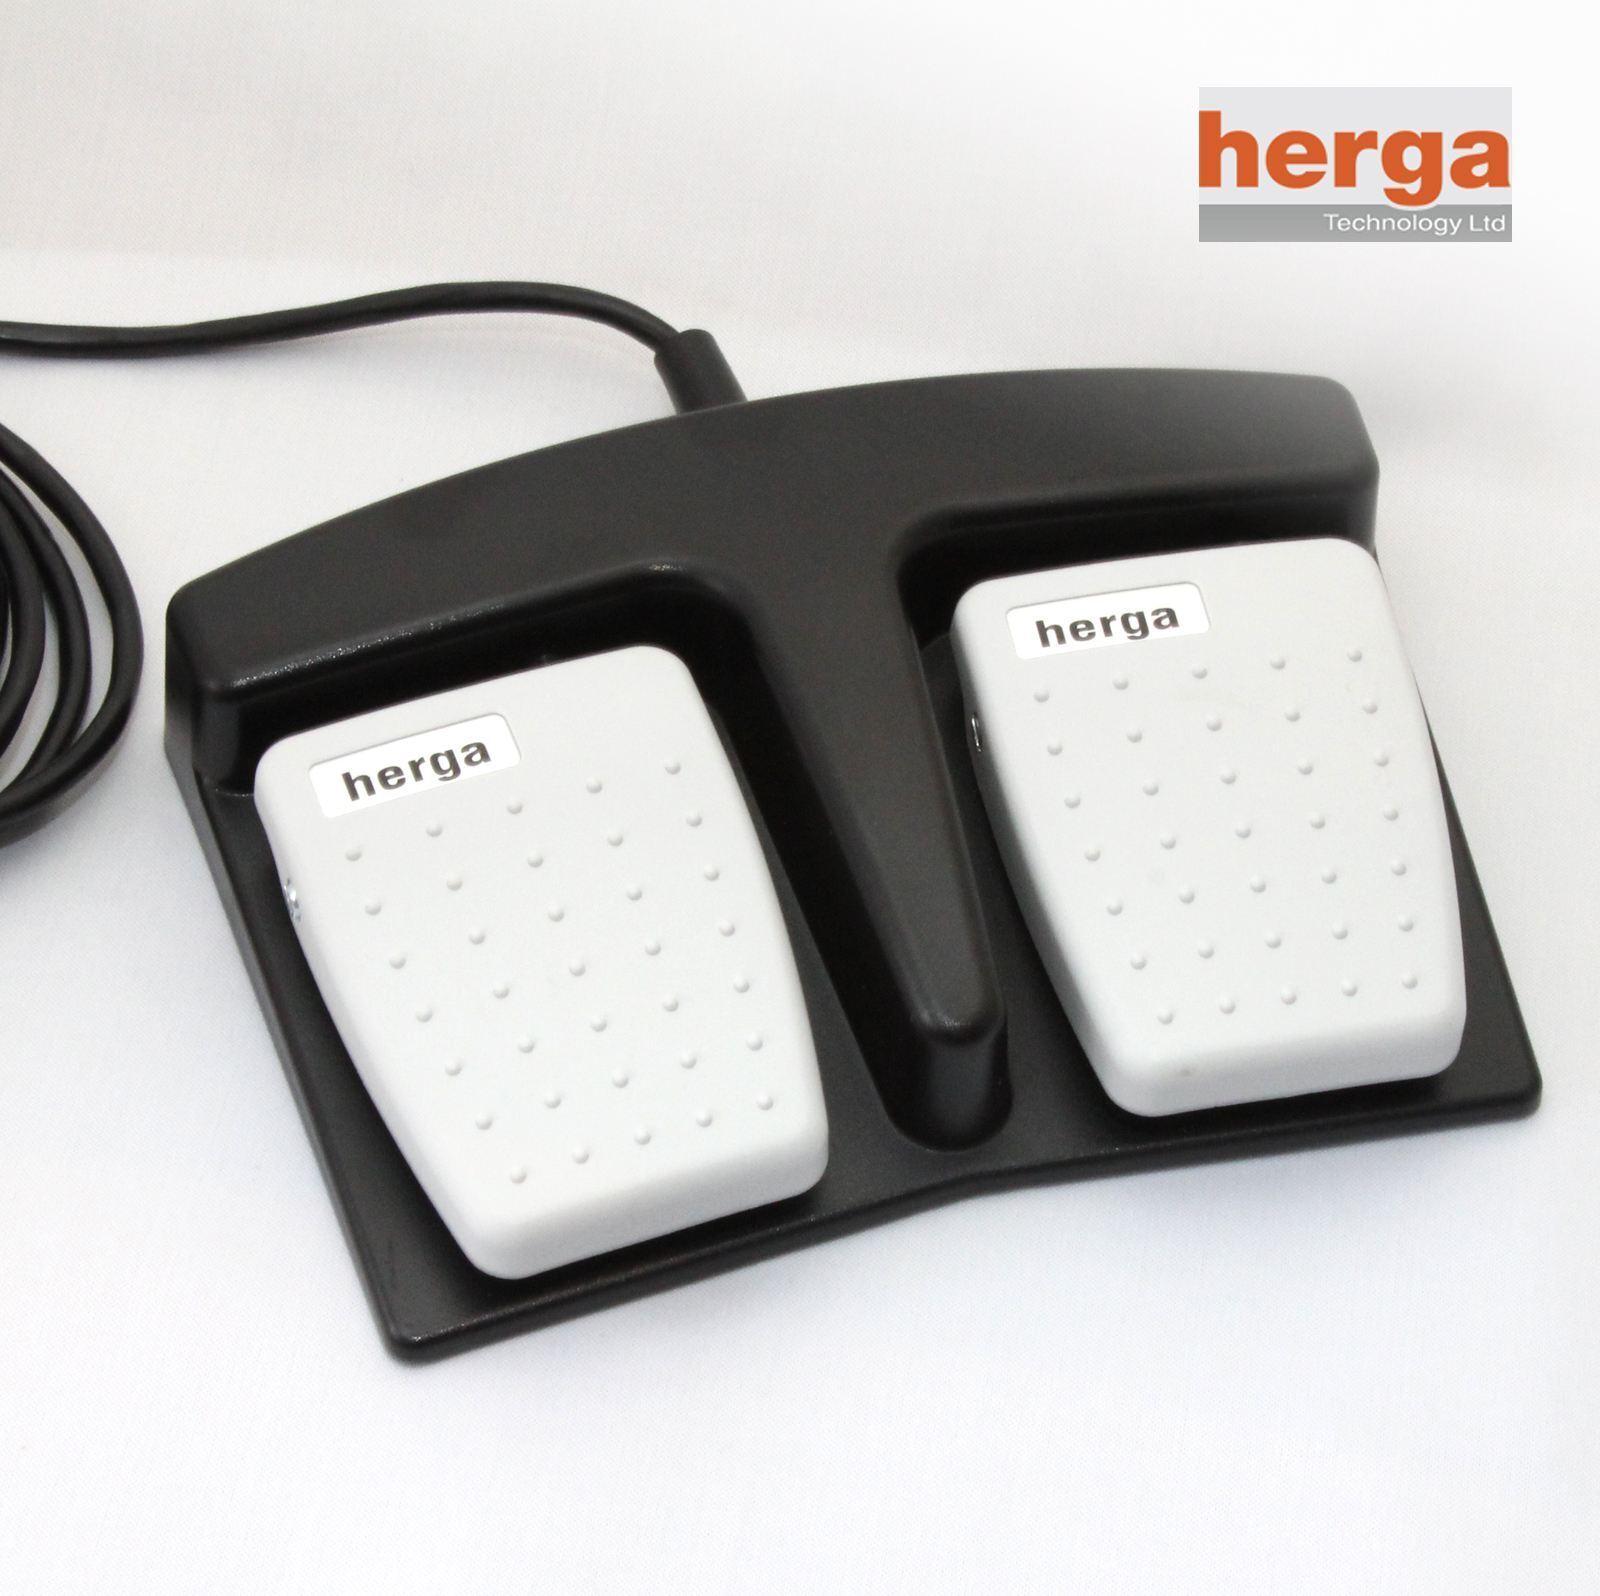 Herga SK-6226-0003 SK-6226-0003 SK-6226-0003 6226 M / Interrupteur Double Pétale 74b7d9